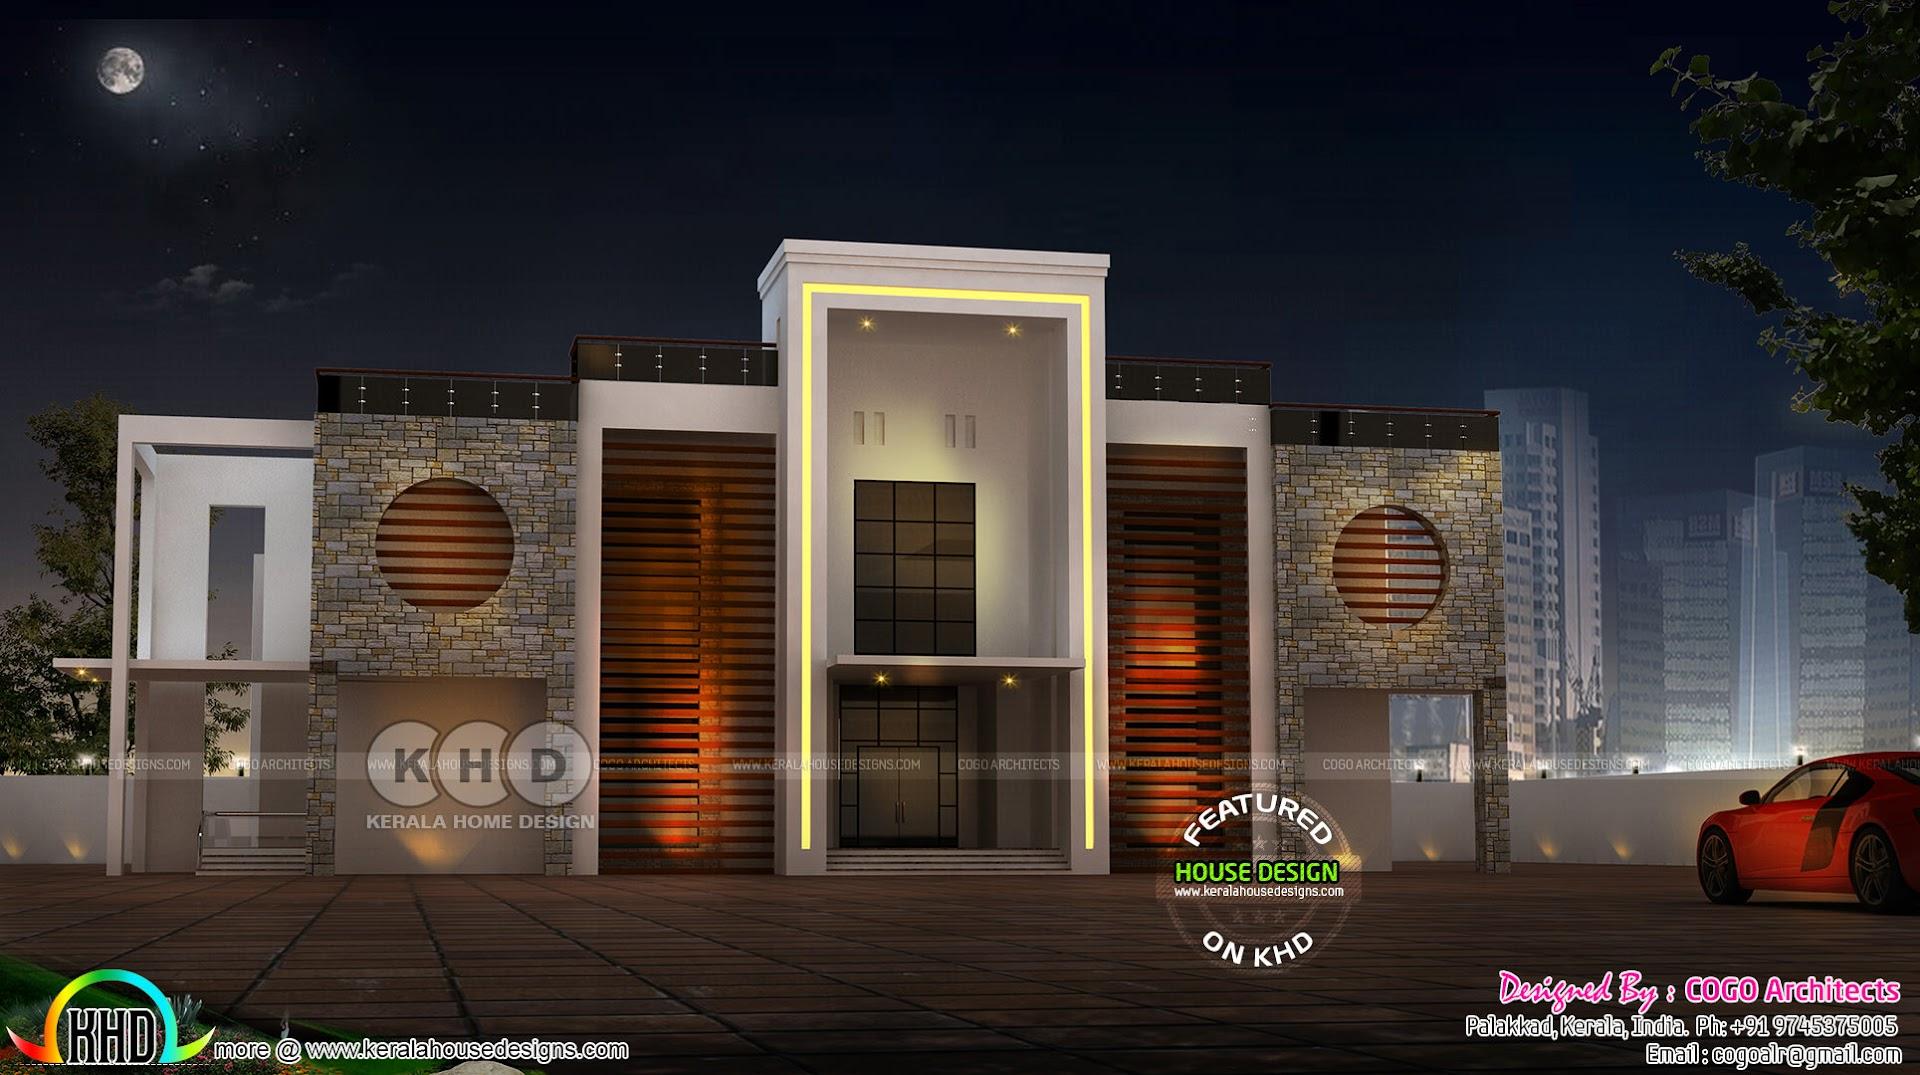 Arabian model 5 bedroom home design kerala home design for Arabian home designs